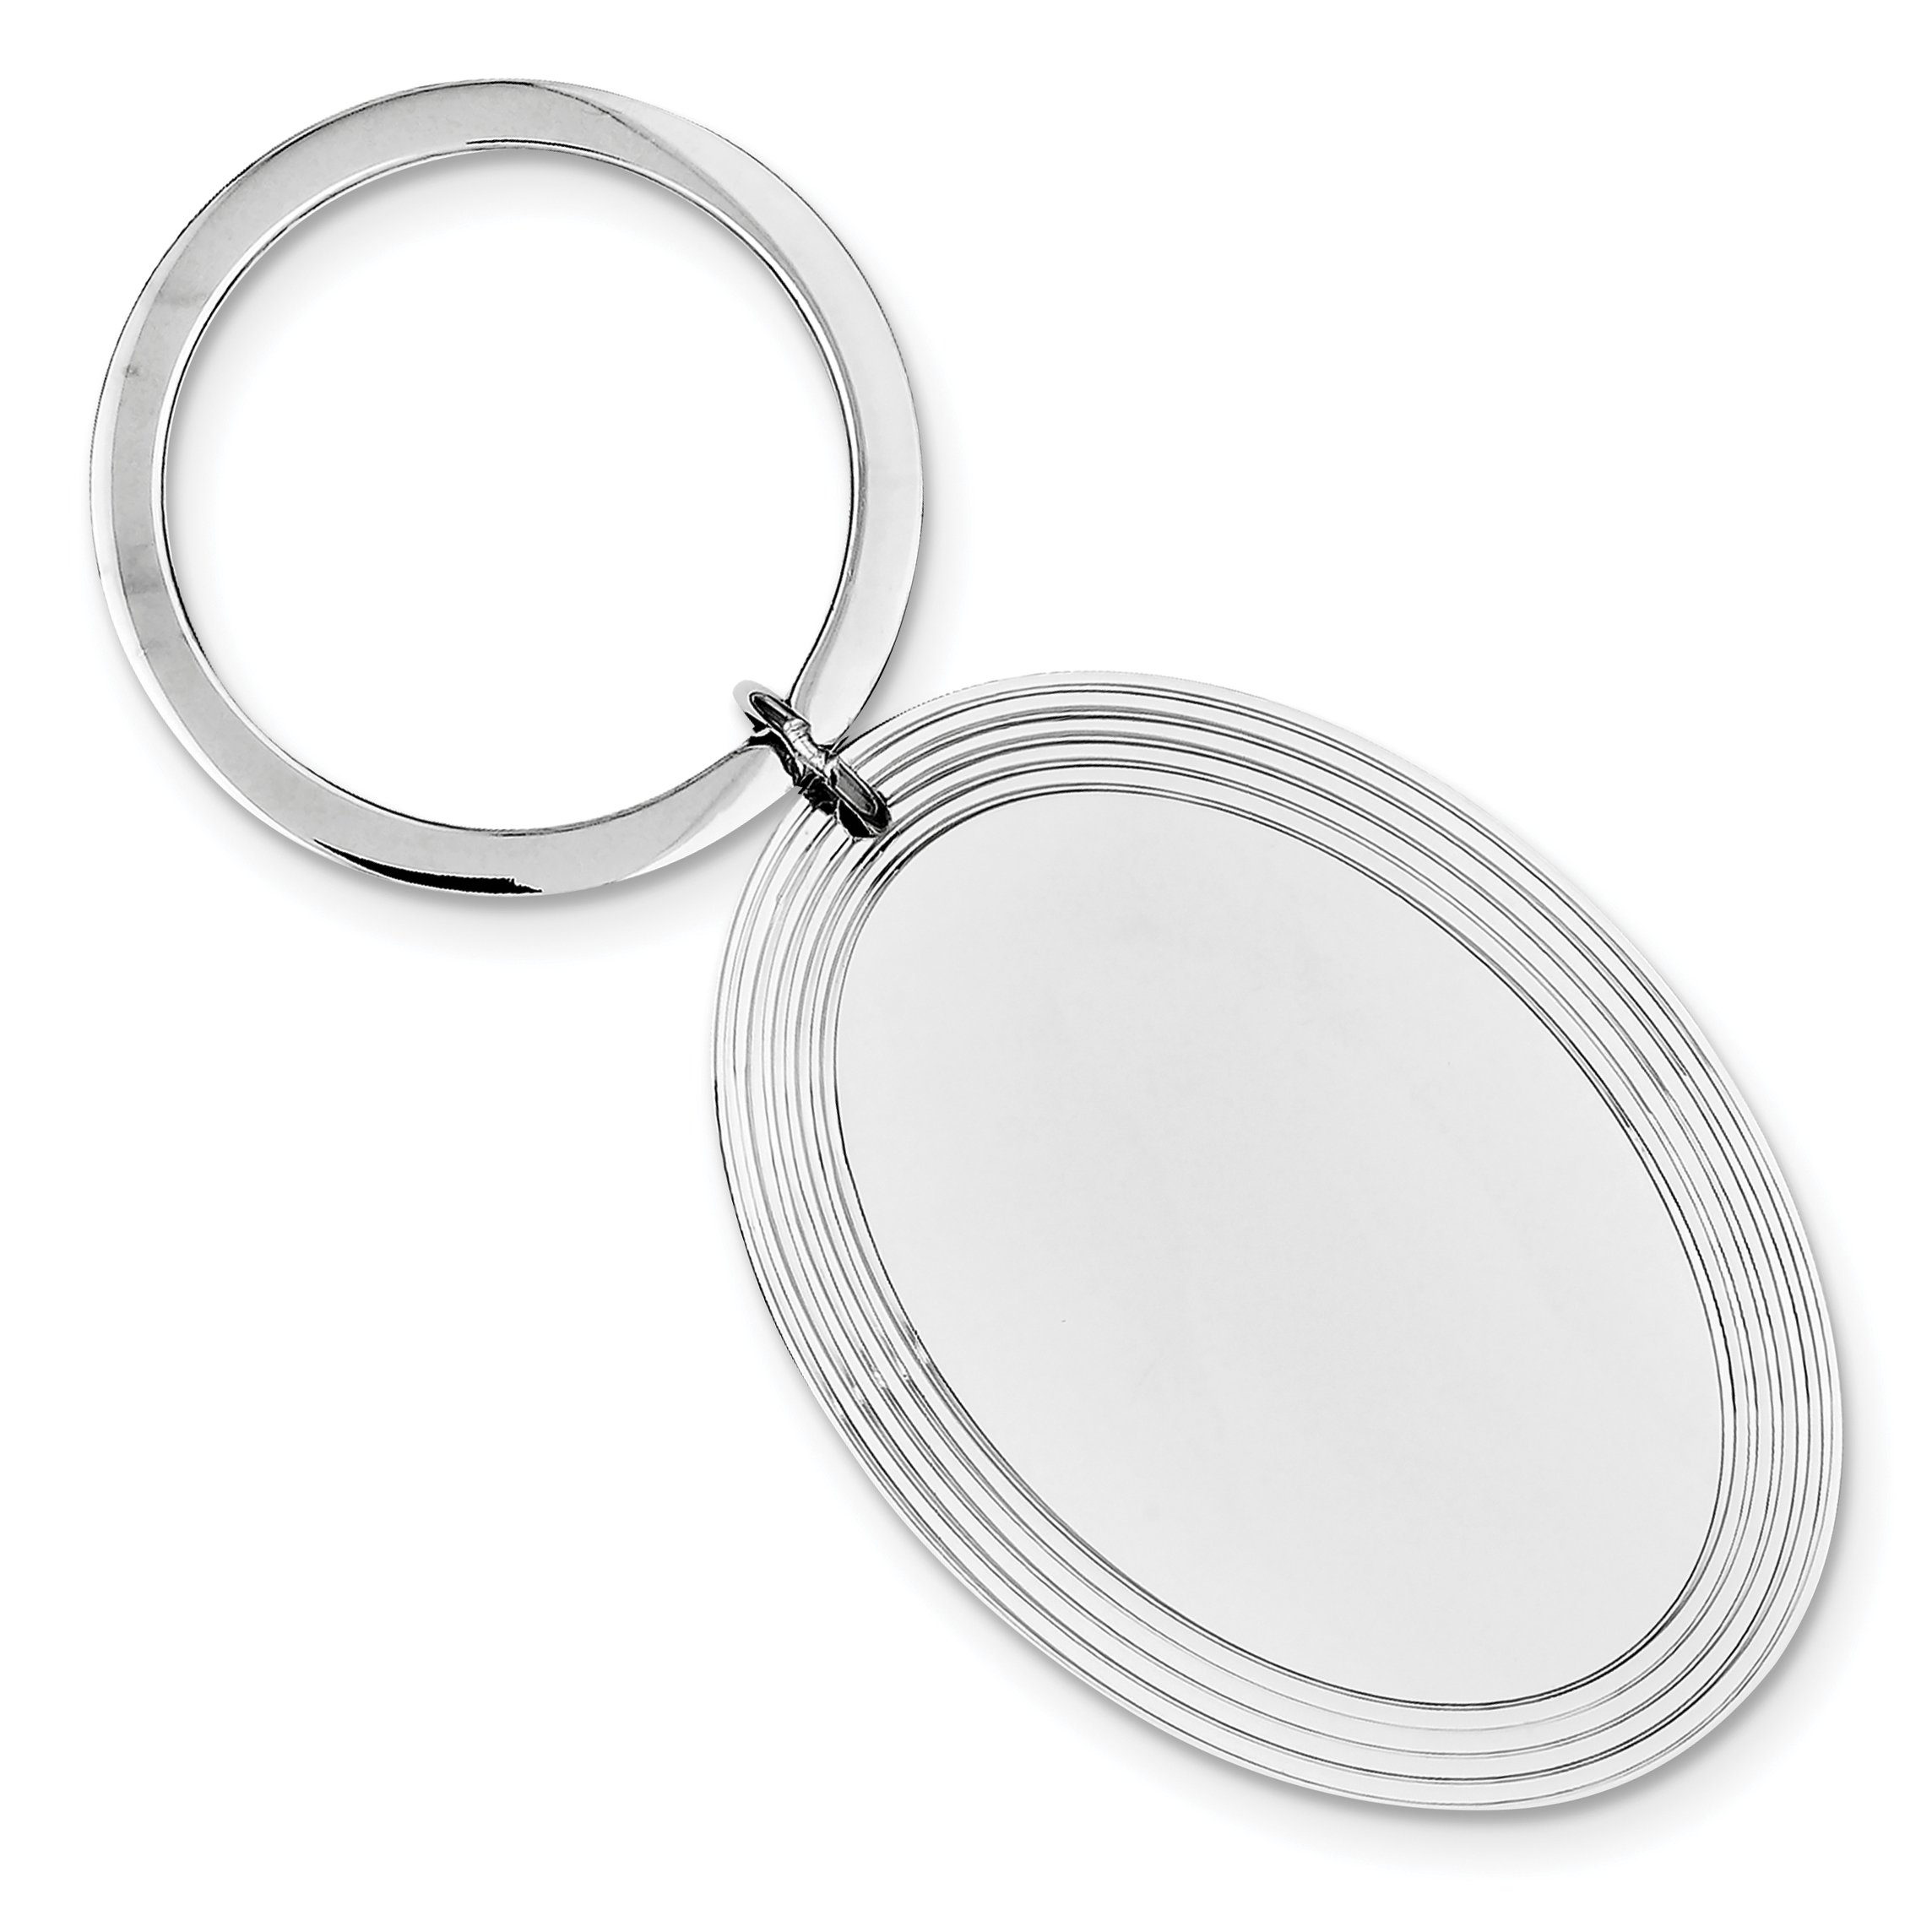 925 Sterling Silver Key Chain